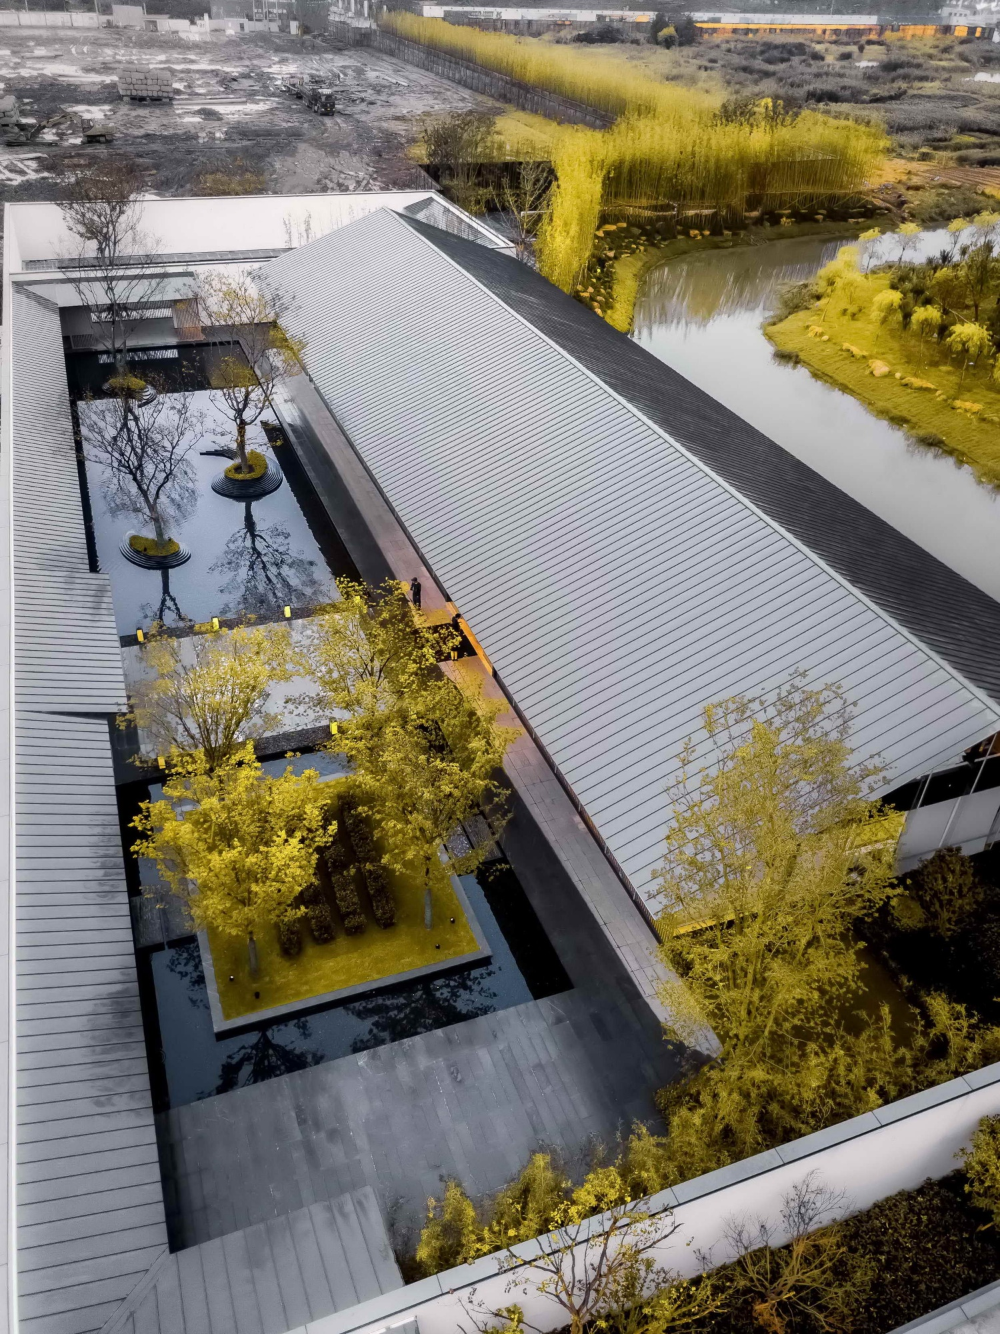 隐一世山水 享半生闲情 万科桂语东方 安道设计 installation art landscape resort